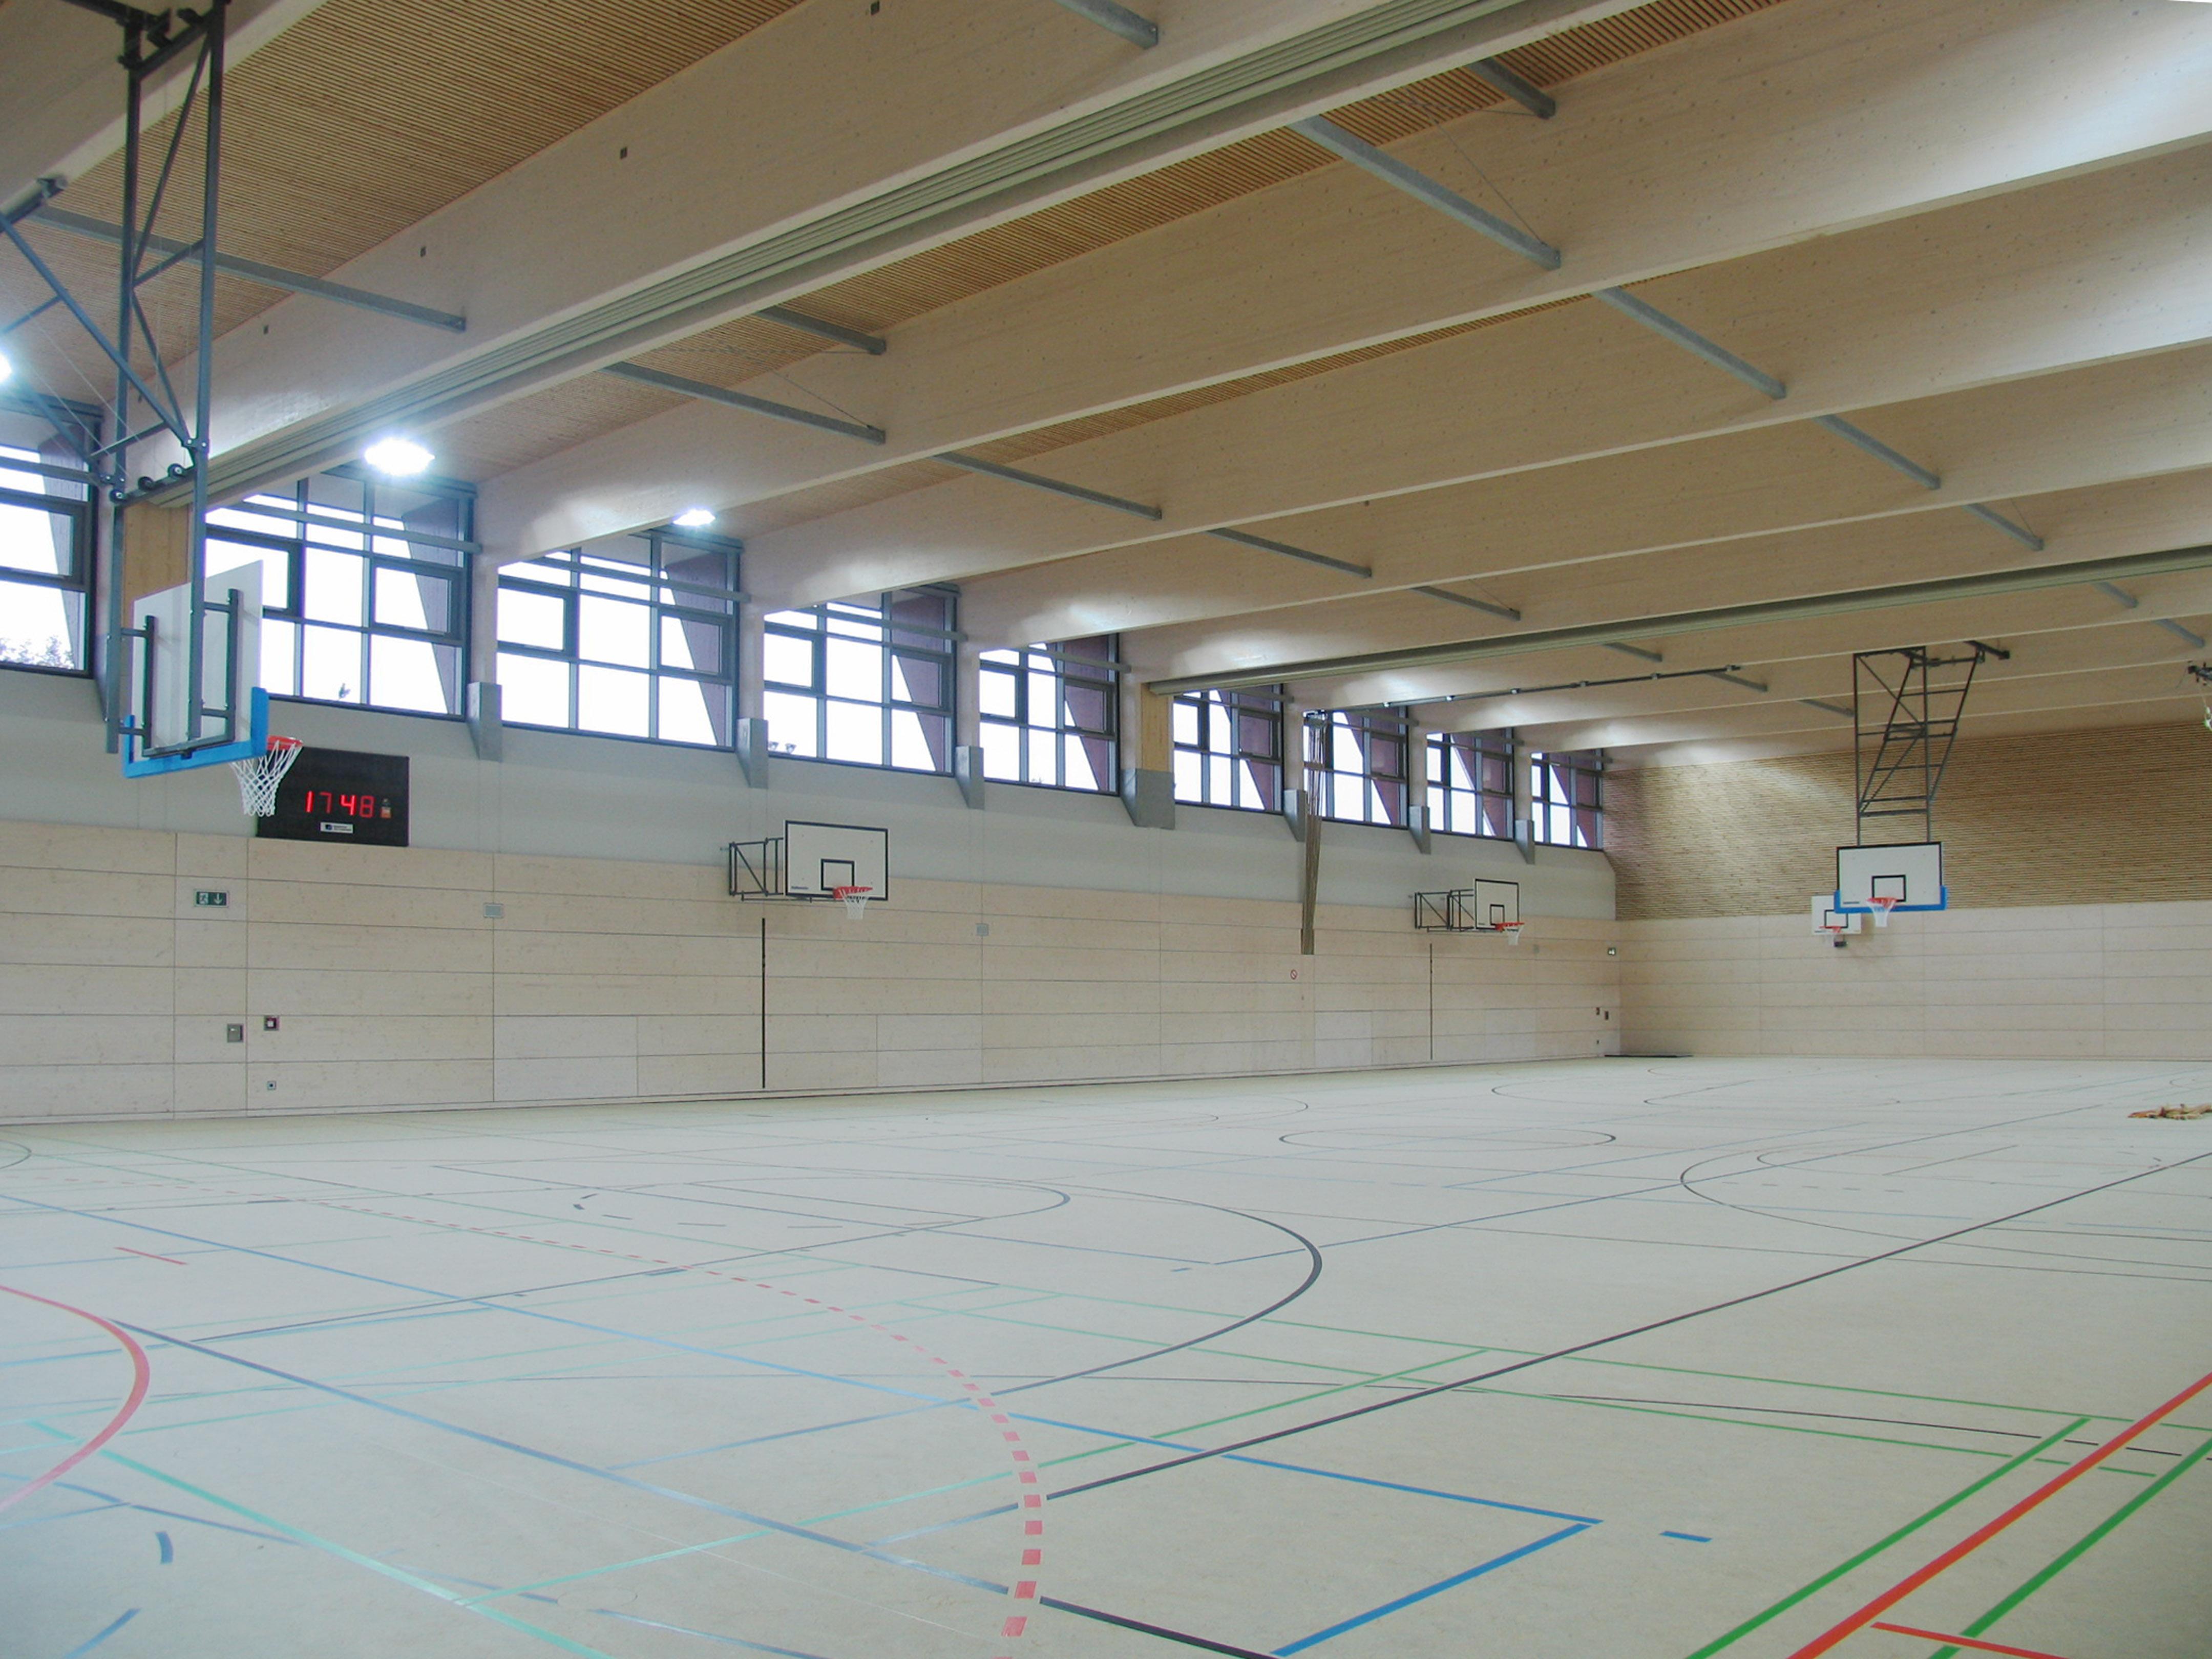 3-fach Sporthalle Manching Sporthalle